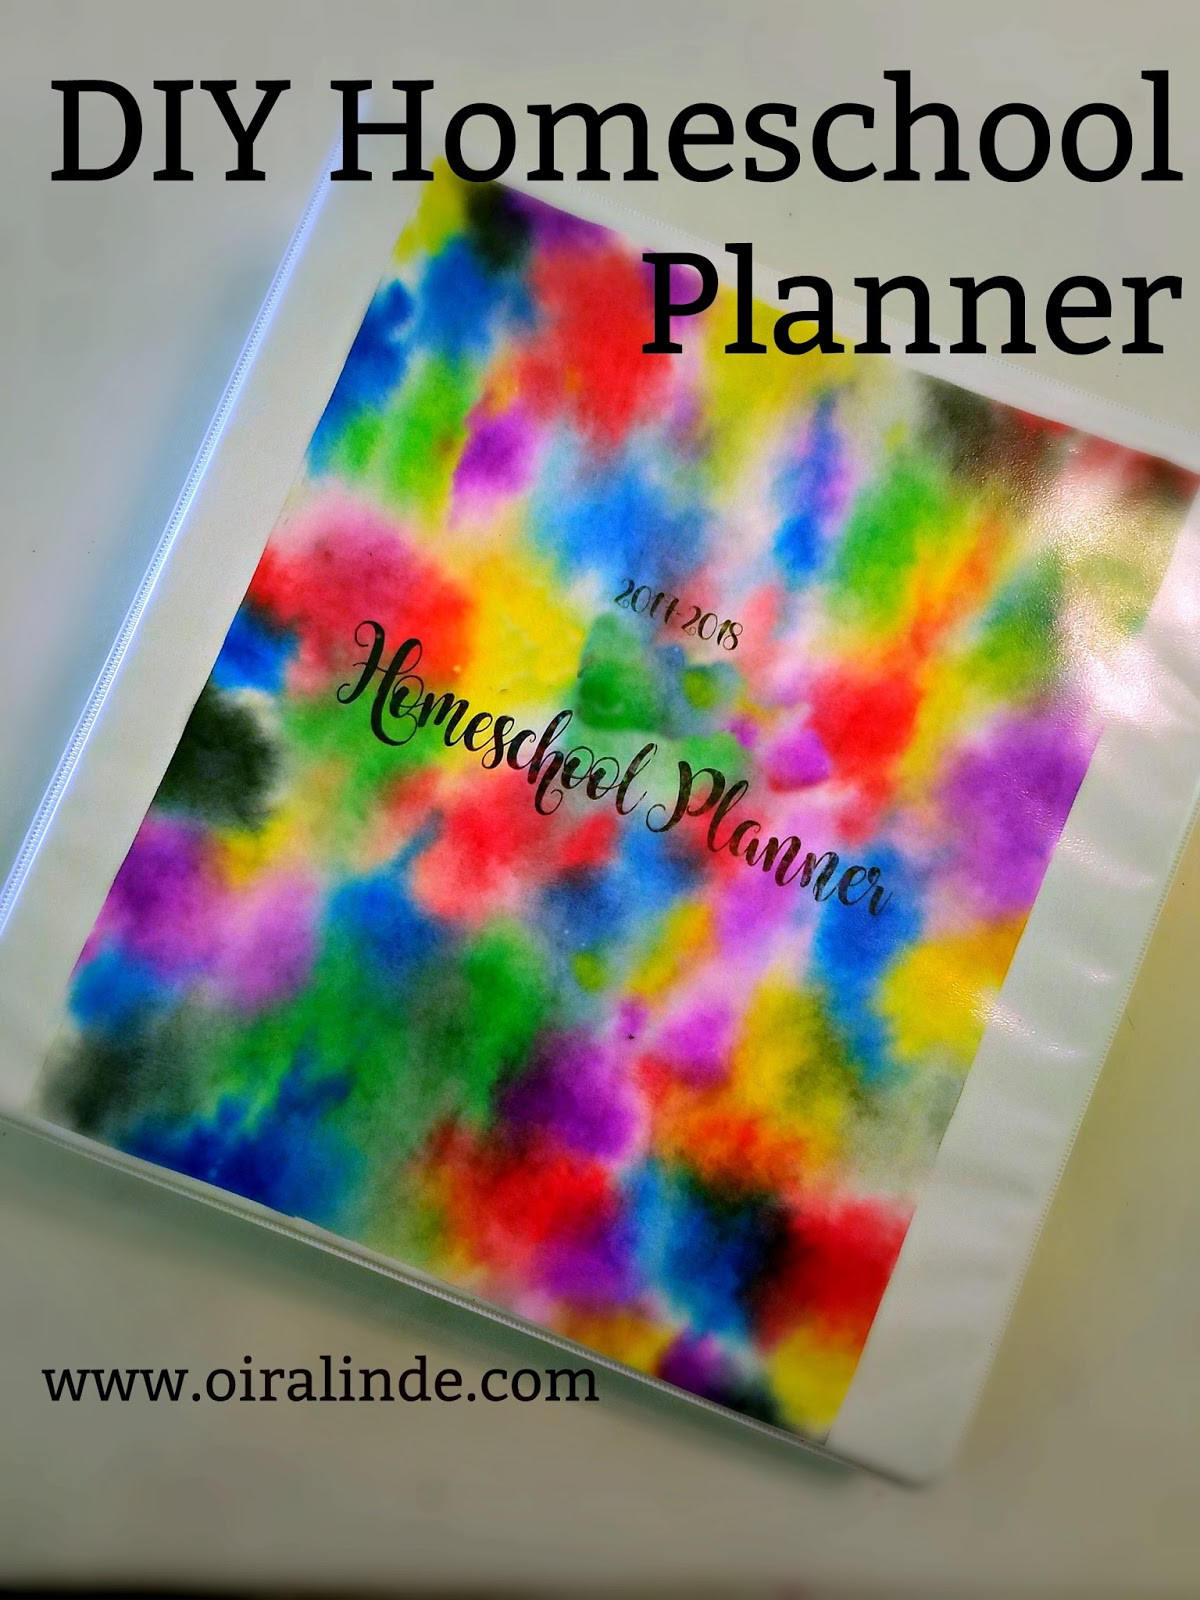 DIY School Planner  Oiralinde My DIY Homeschool Planner